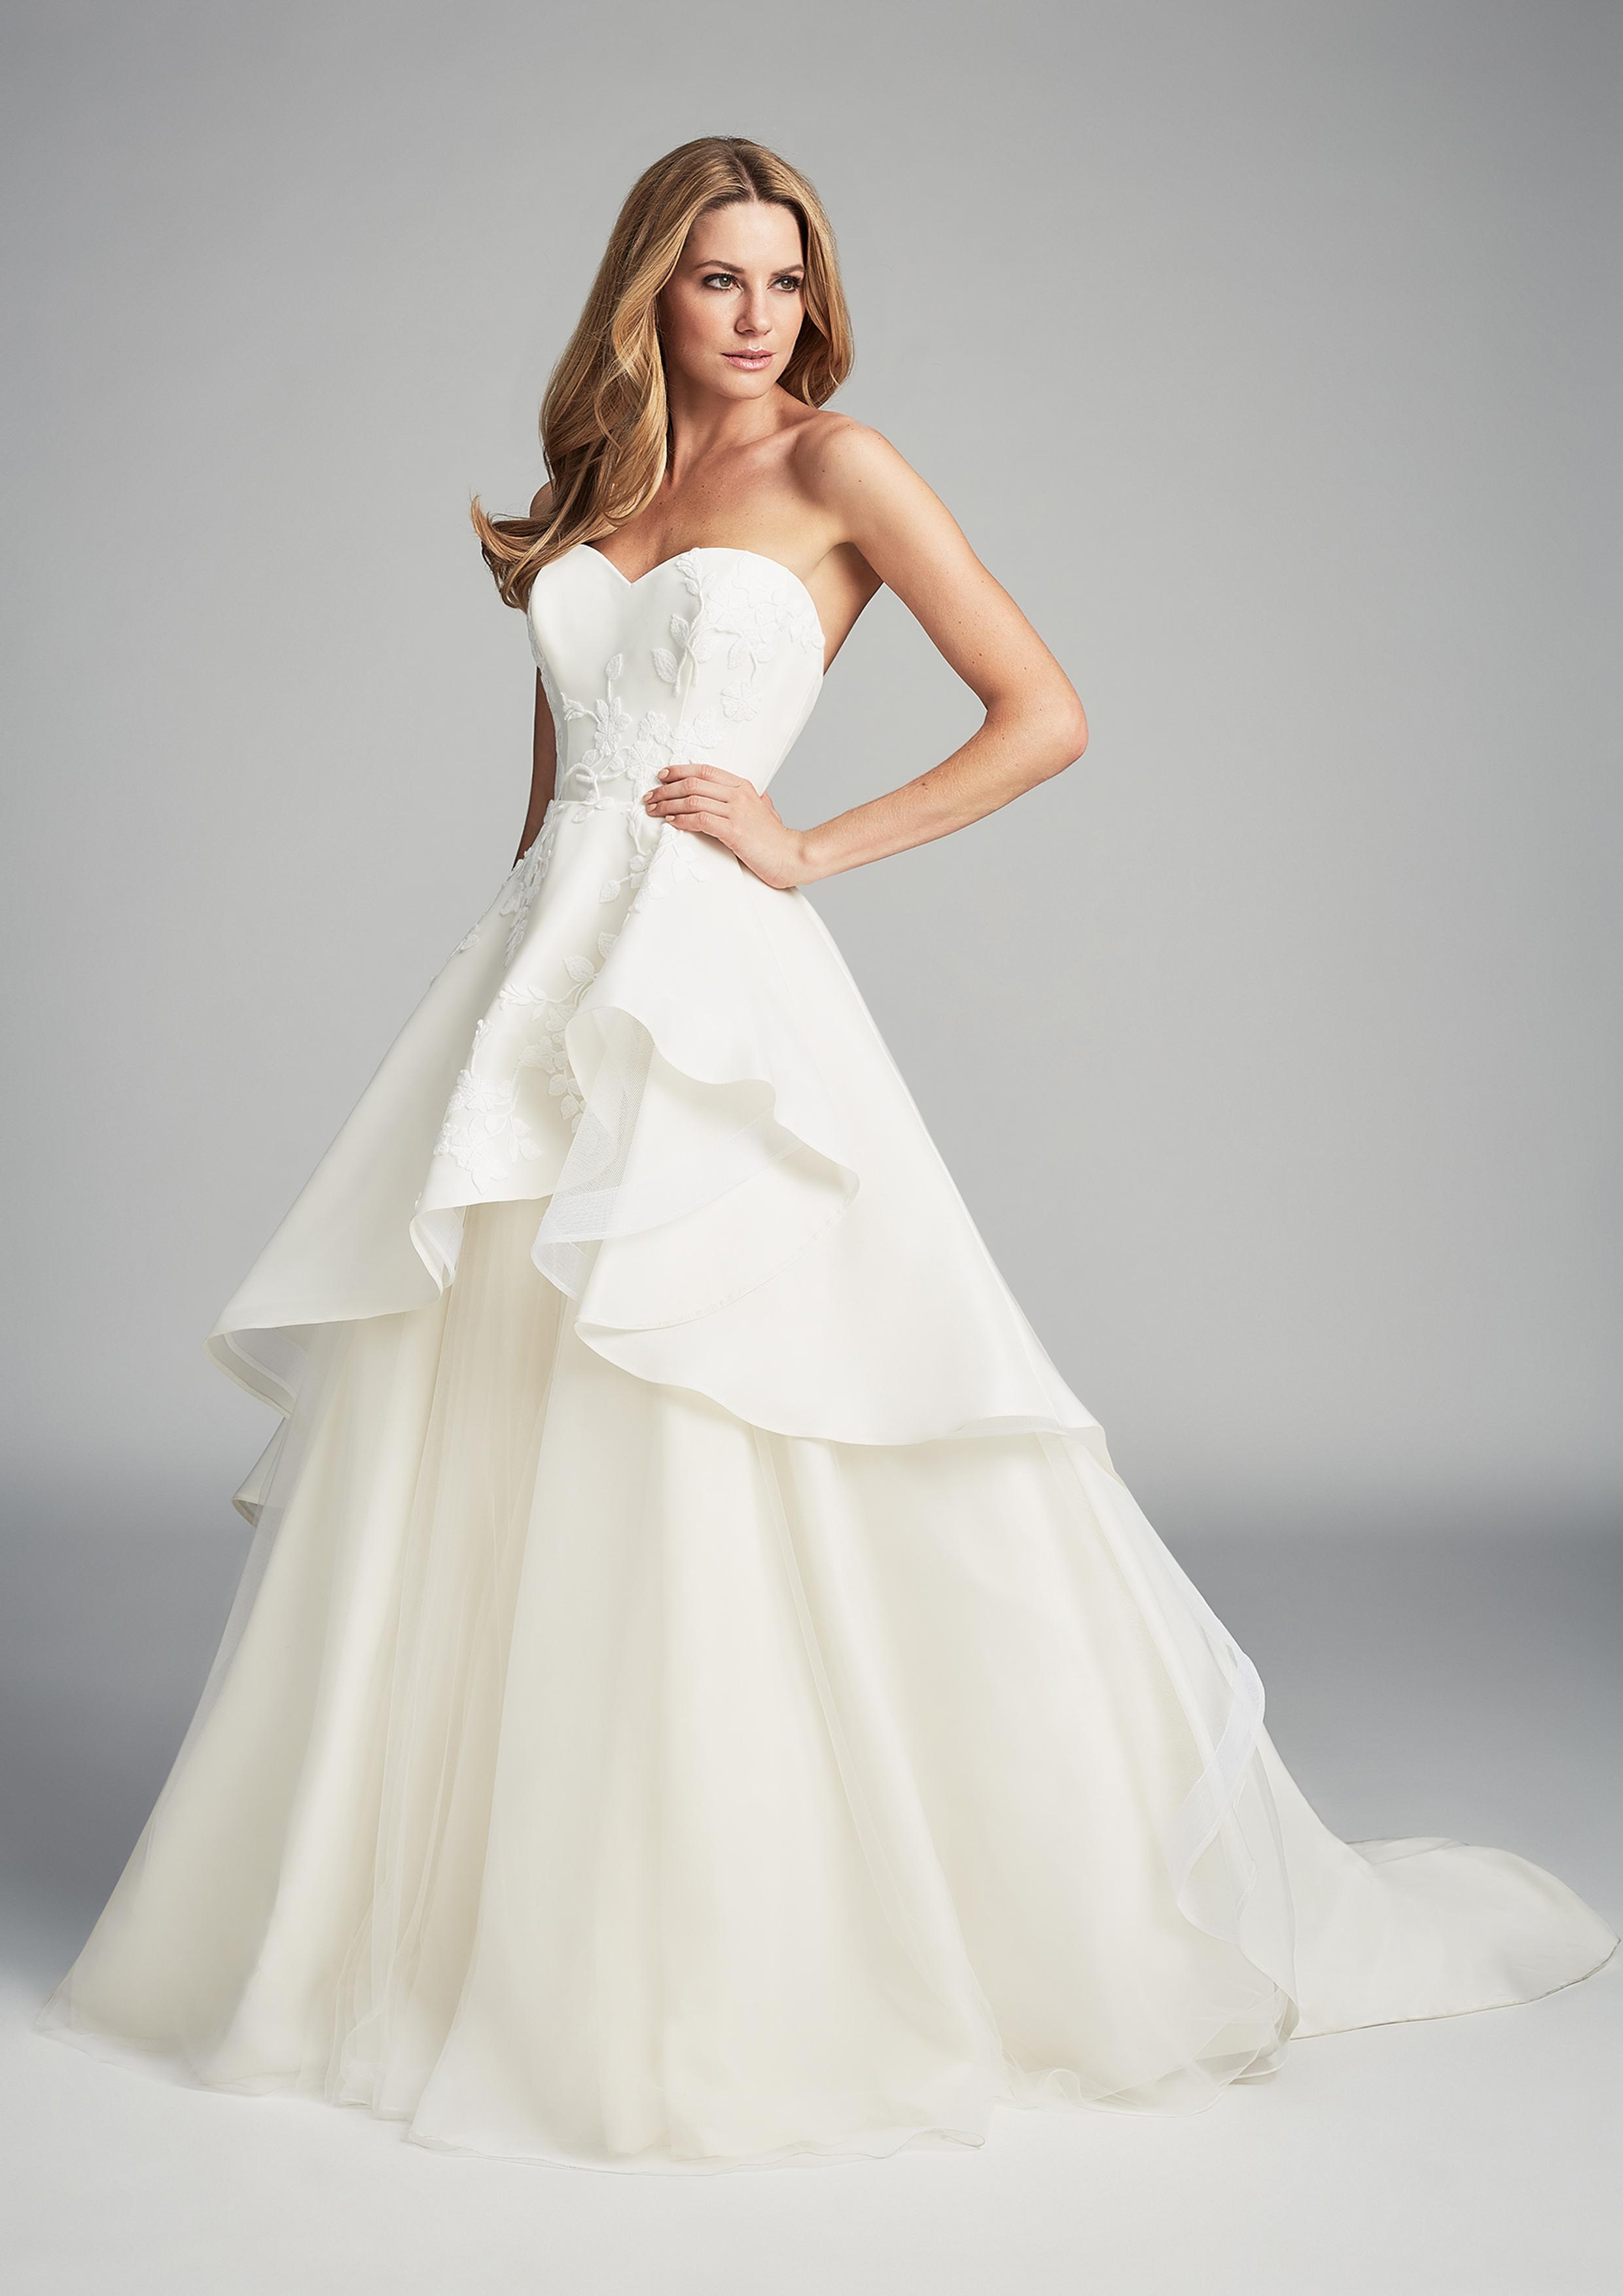 Eternal Love designer wedding dresses by Caroline Castigliano